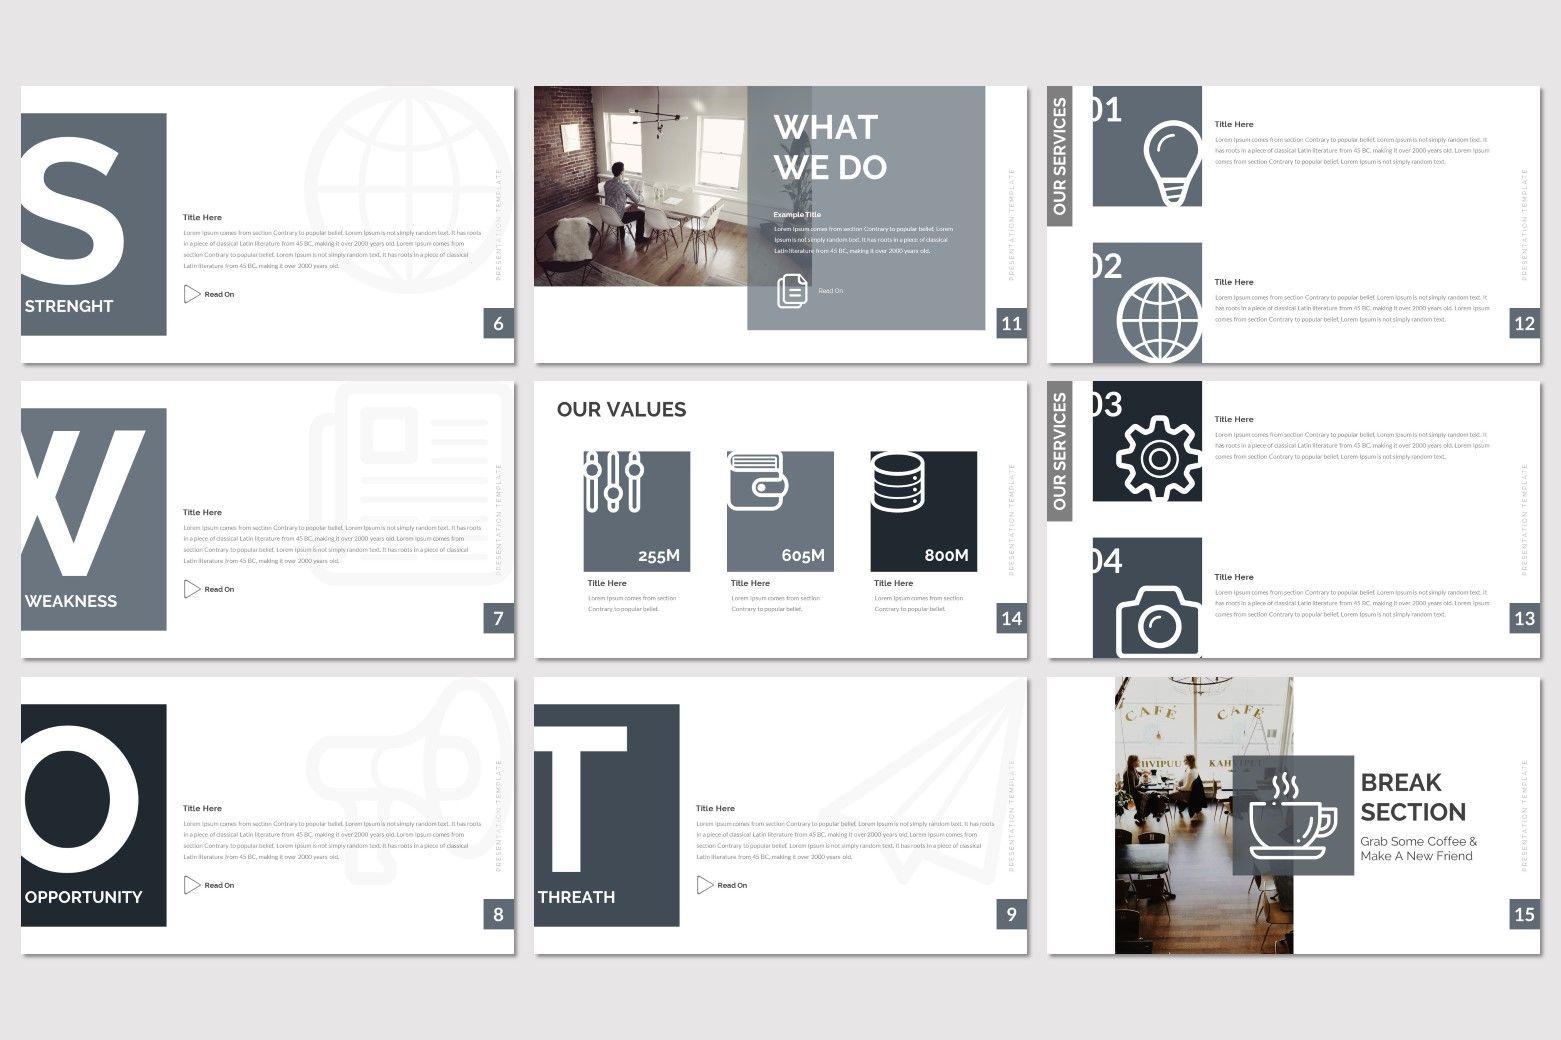 Nera - PowerPoint Template, Slide 3, 08557, Presentation Templates — PoweredTemplate.com